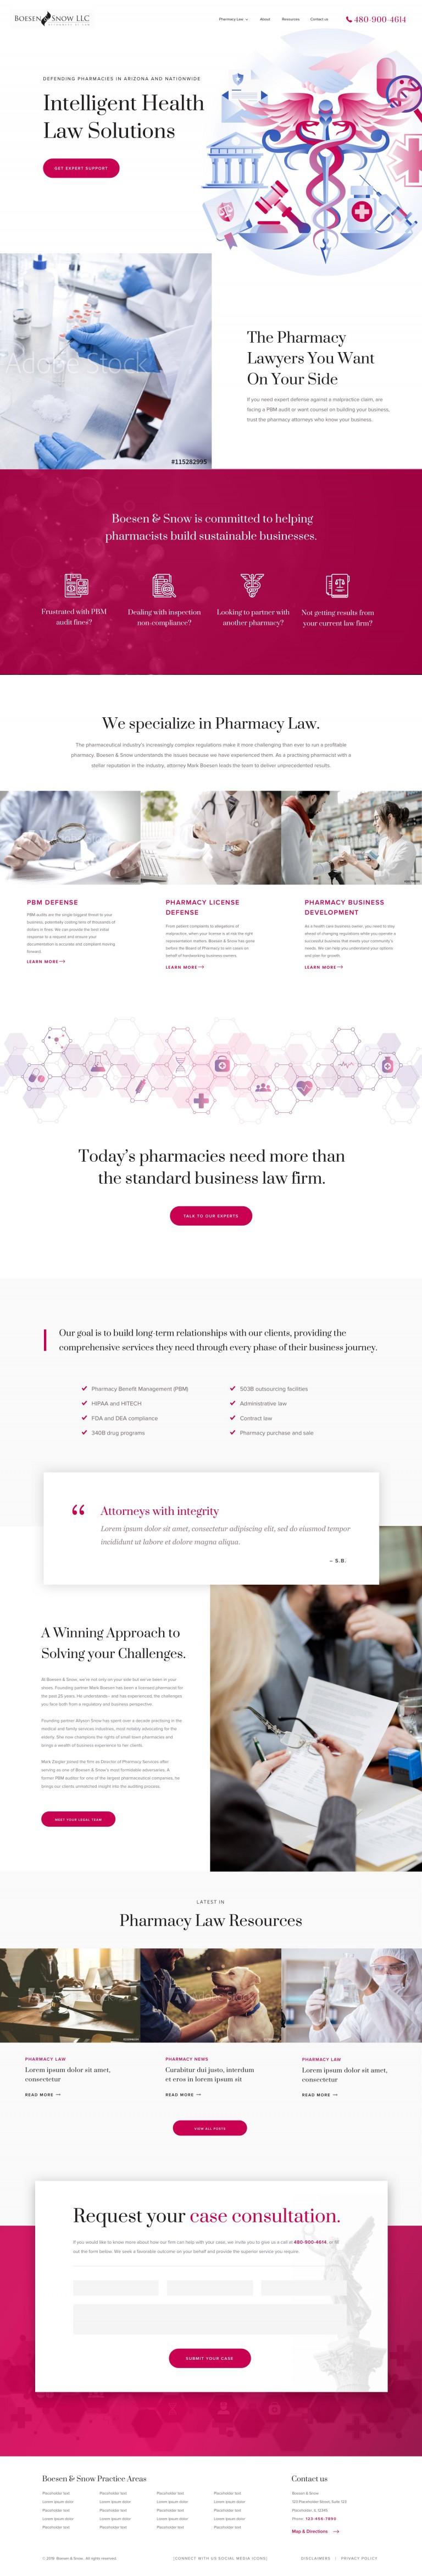 web-design-portfolio-bs-1